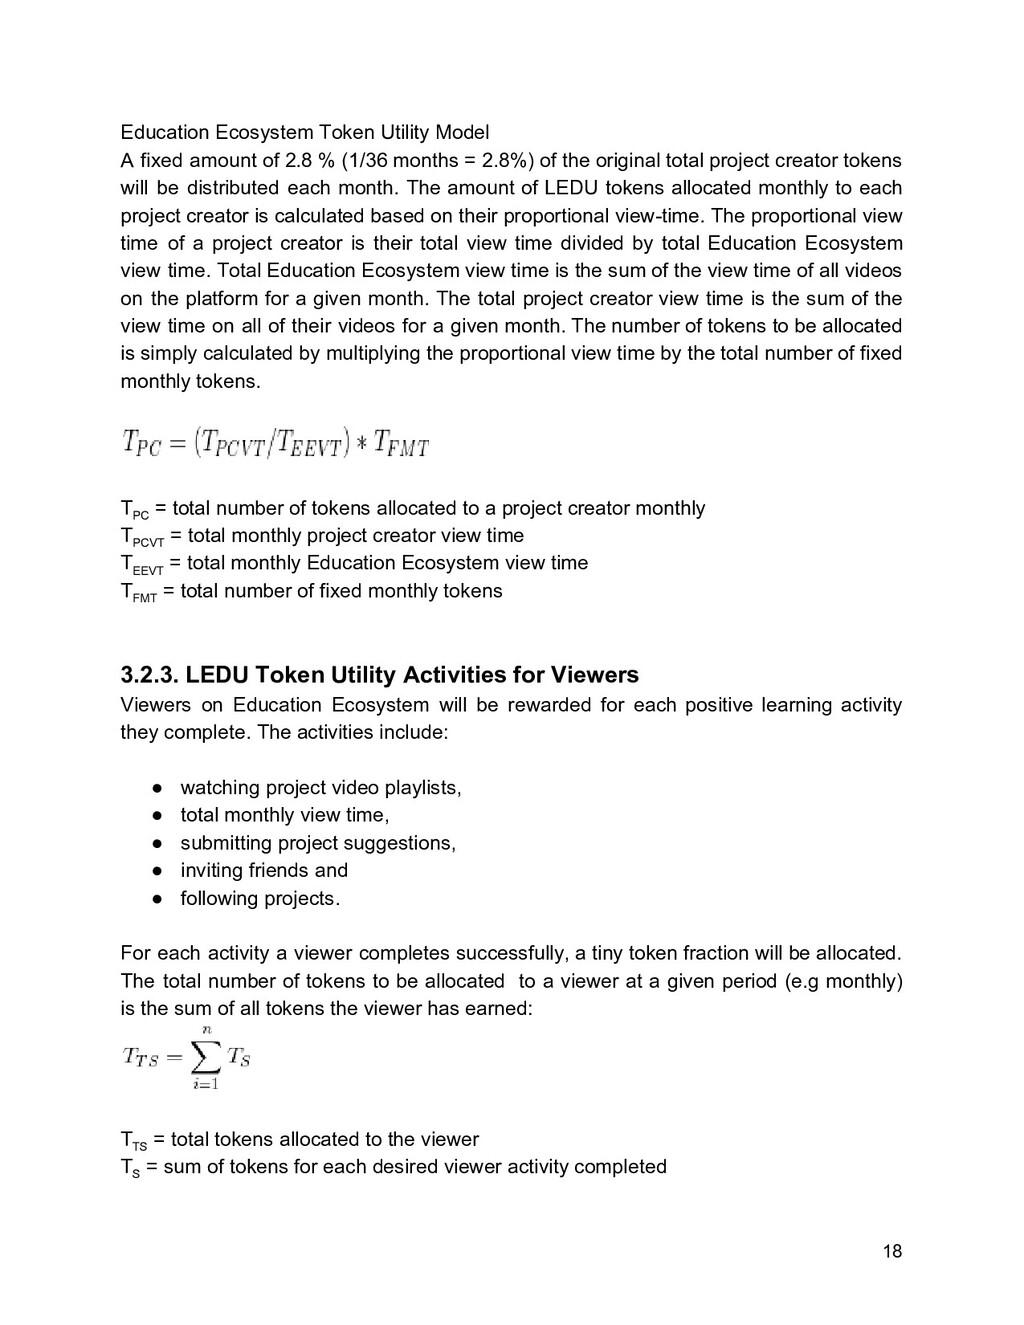 Education Ecosystem Token Utility Model A fixed...